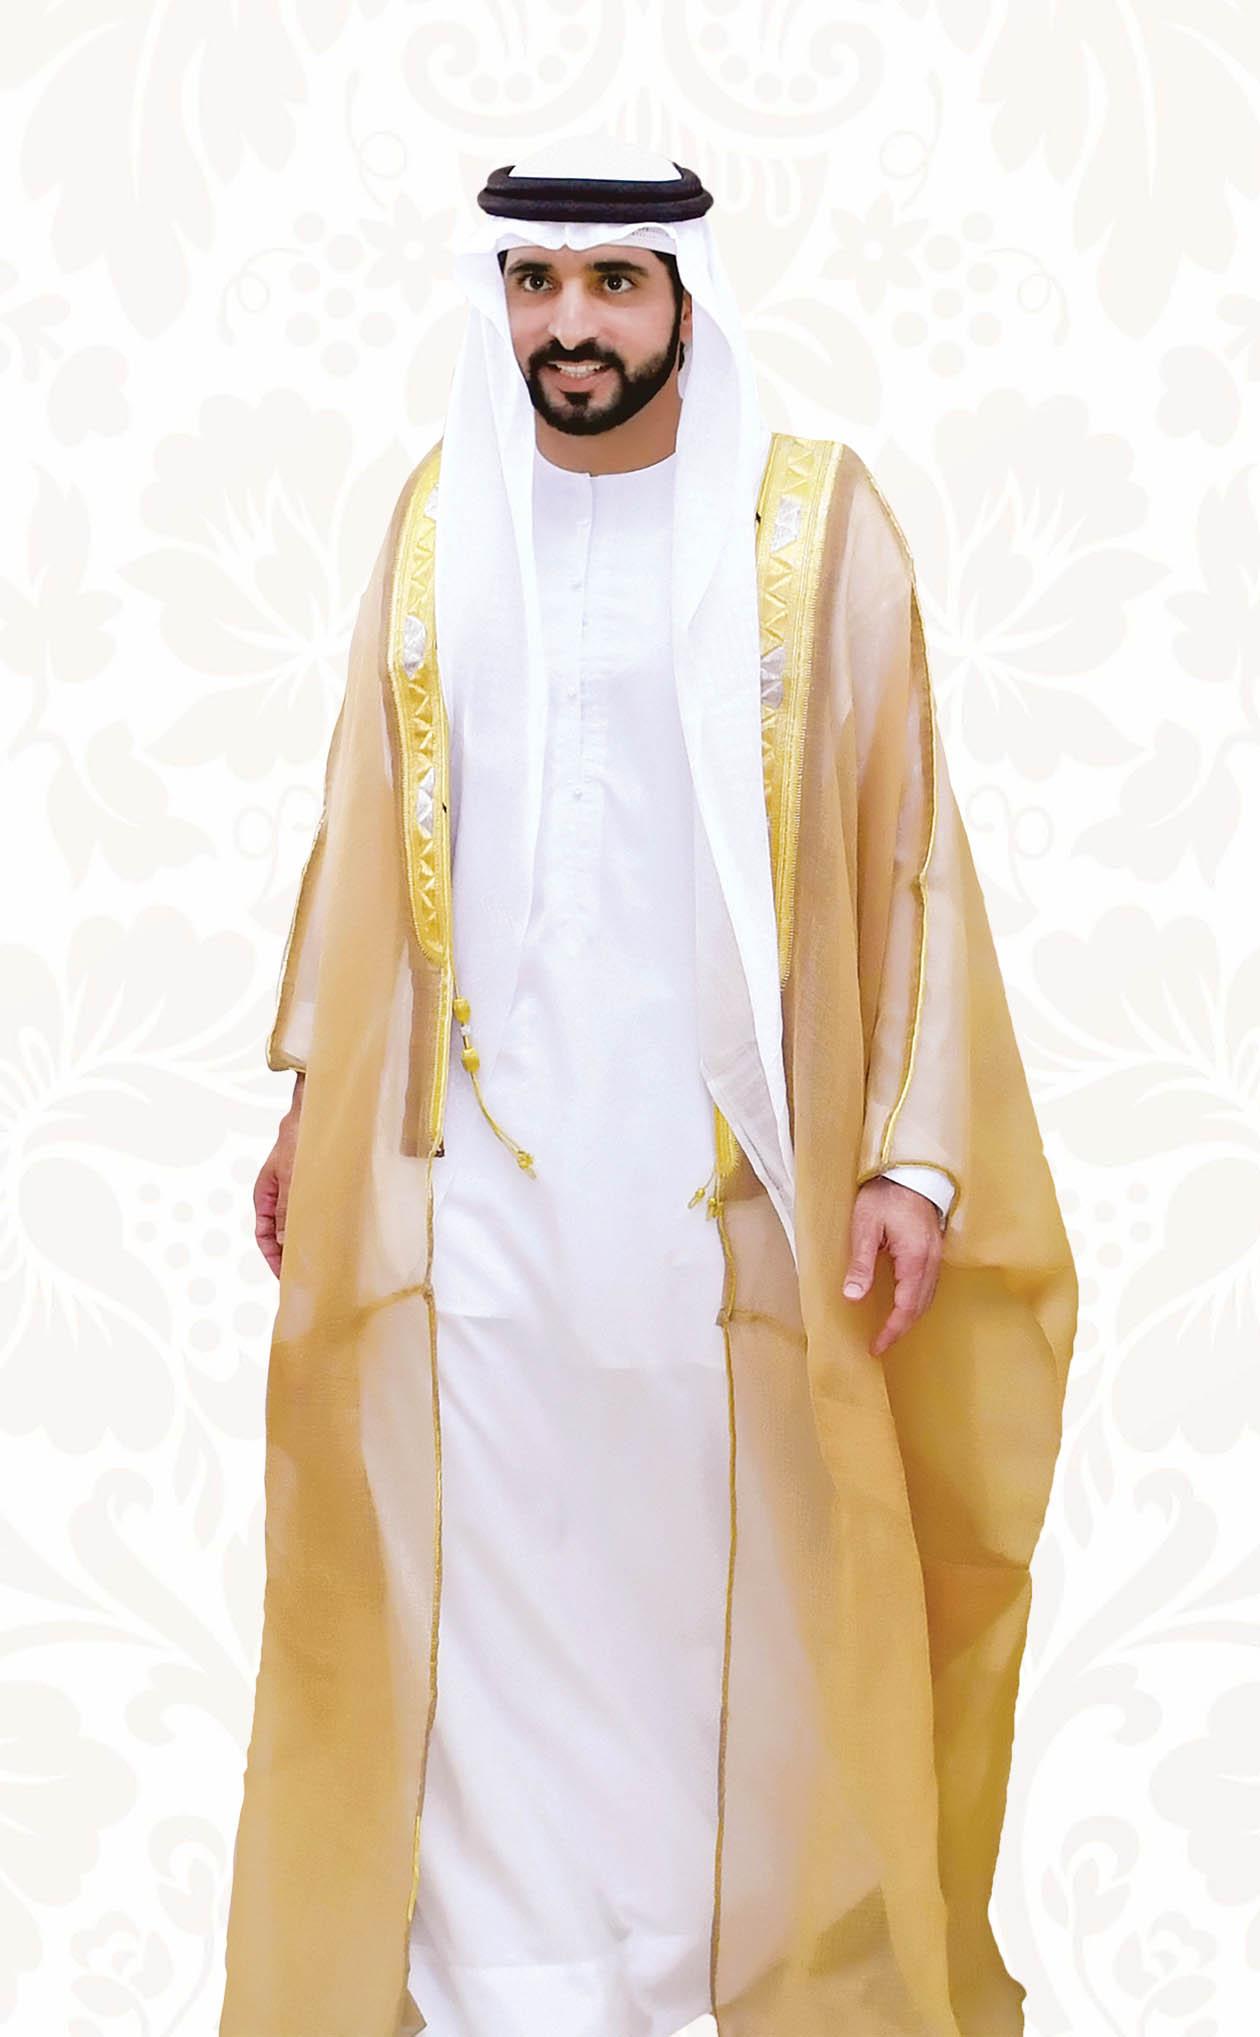 حمدان بـن محمــد قيادة واثقة على خـطى محمد بن راشد Menafn Com